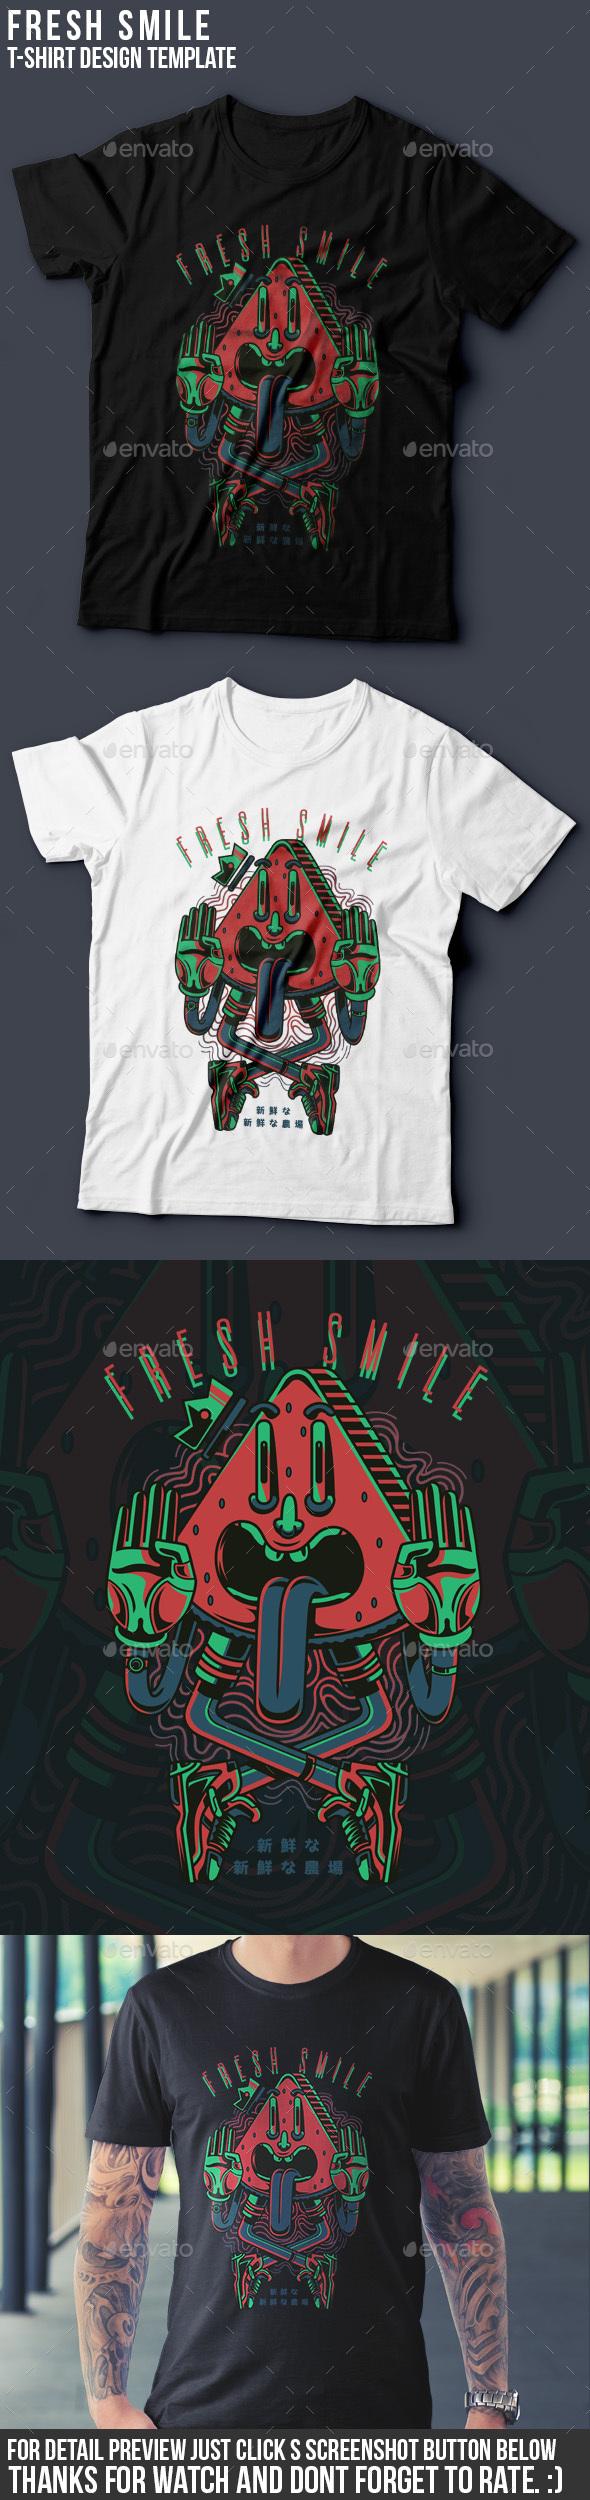 Fresh Smile T-Shirt Design - Funny Designs